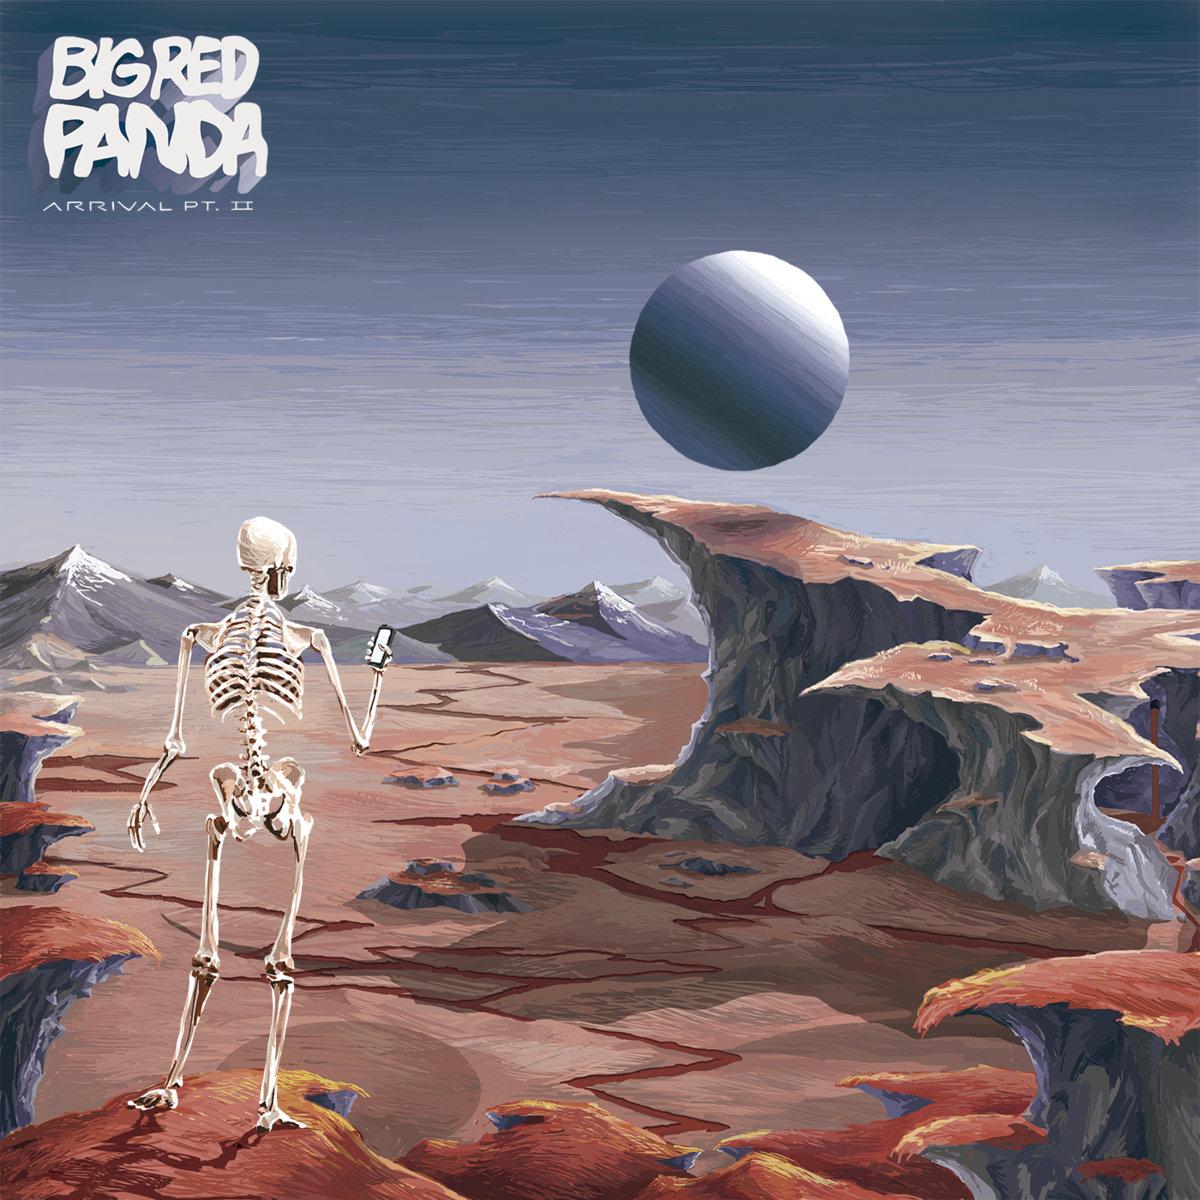 Big Red Panda - Arrival Pt. II